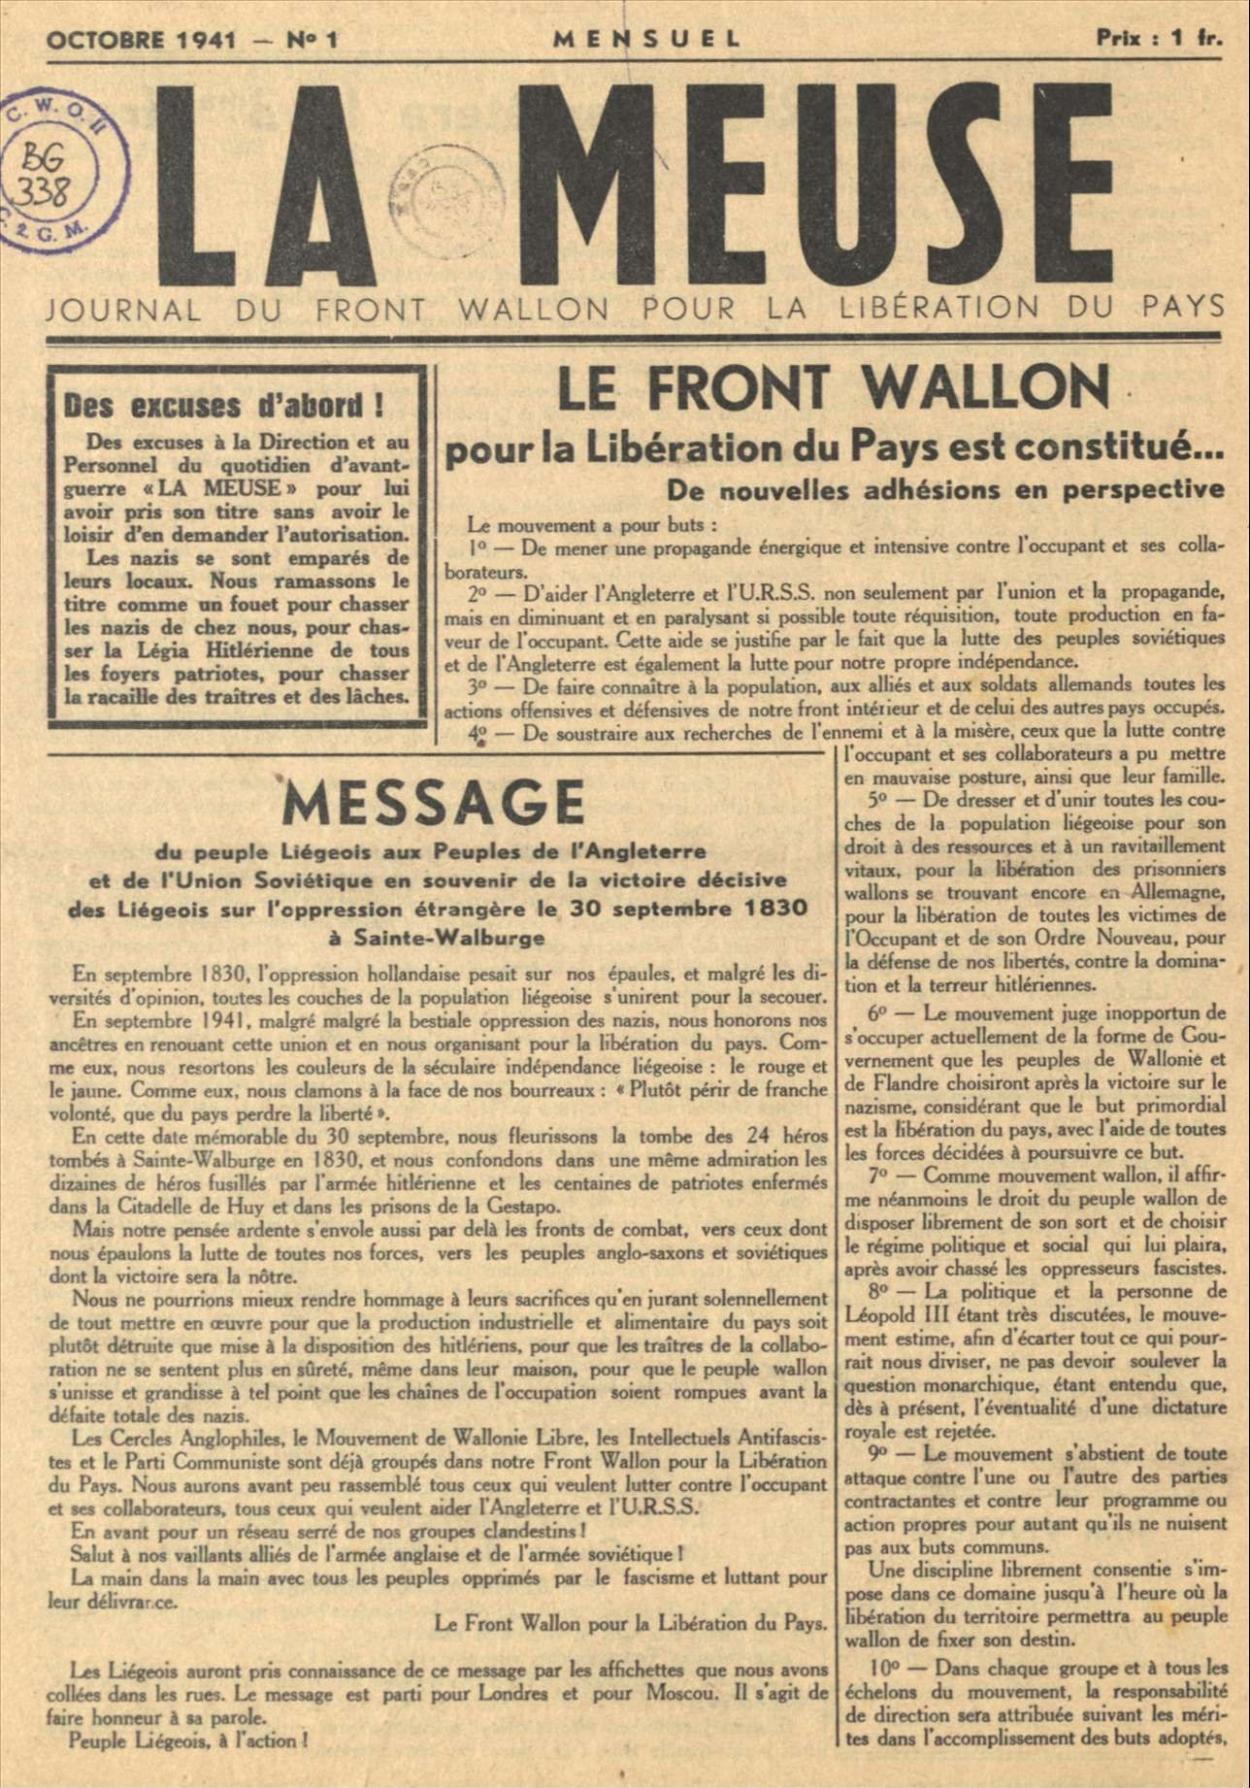 soma_bg337_1941-10_01_001-00001-la-meuse-oct-1941-front-wallon(2).jpg